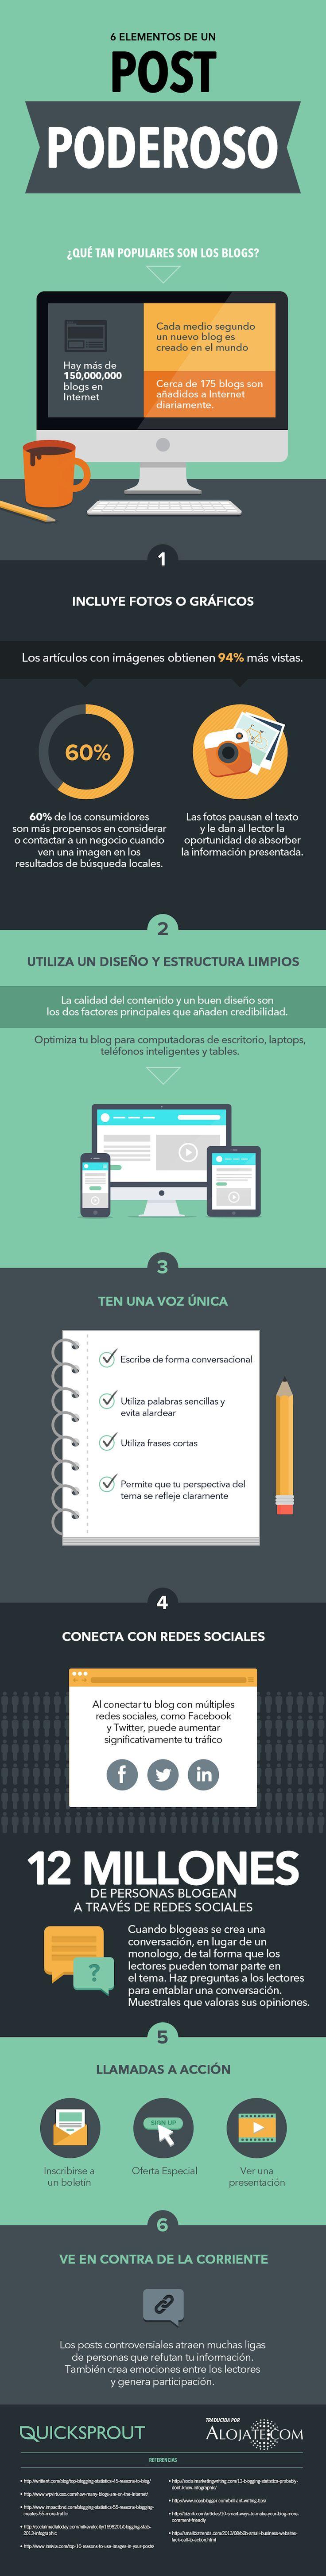 6 características de un buen blog post http://www.luismaram.com/2014/11/14/6-caracteristicas-de-un-buen-blog-post